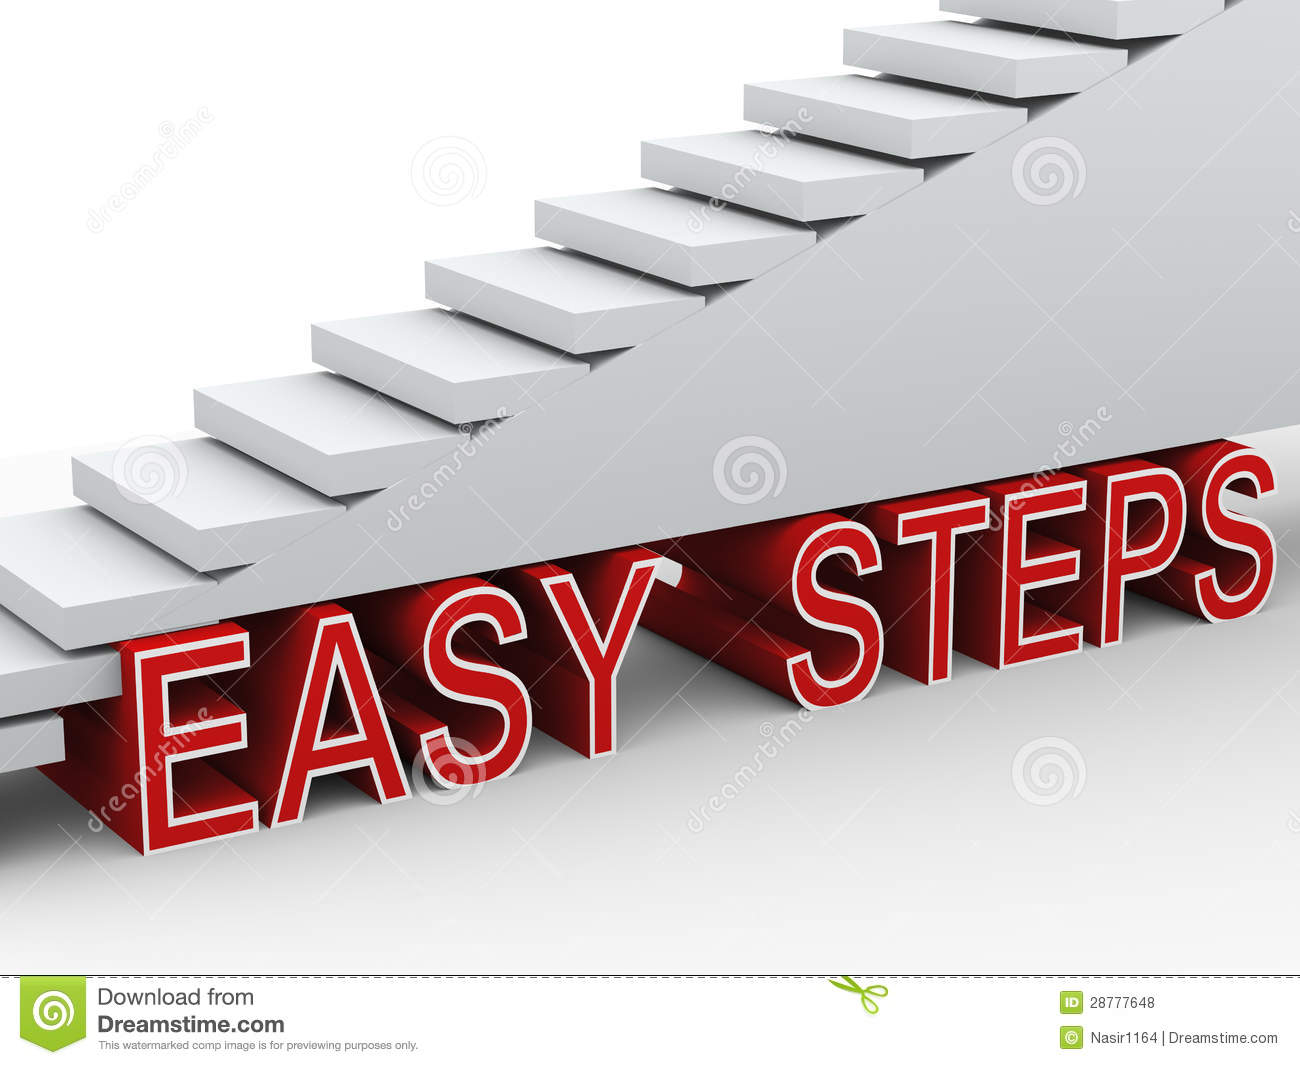 Easy Steps Clipart.